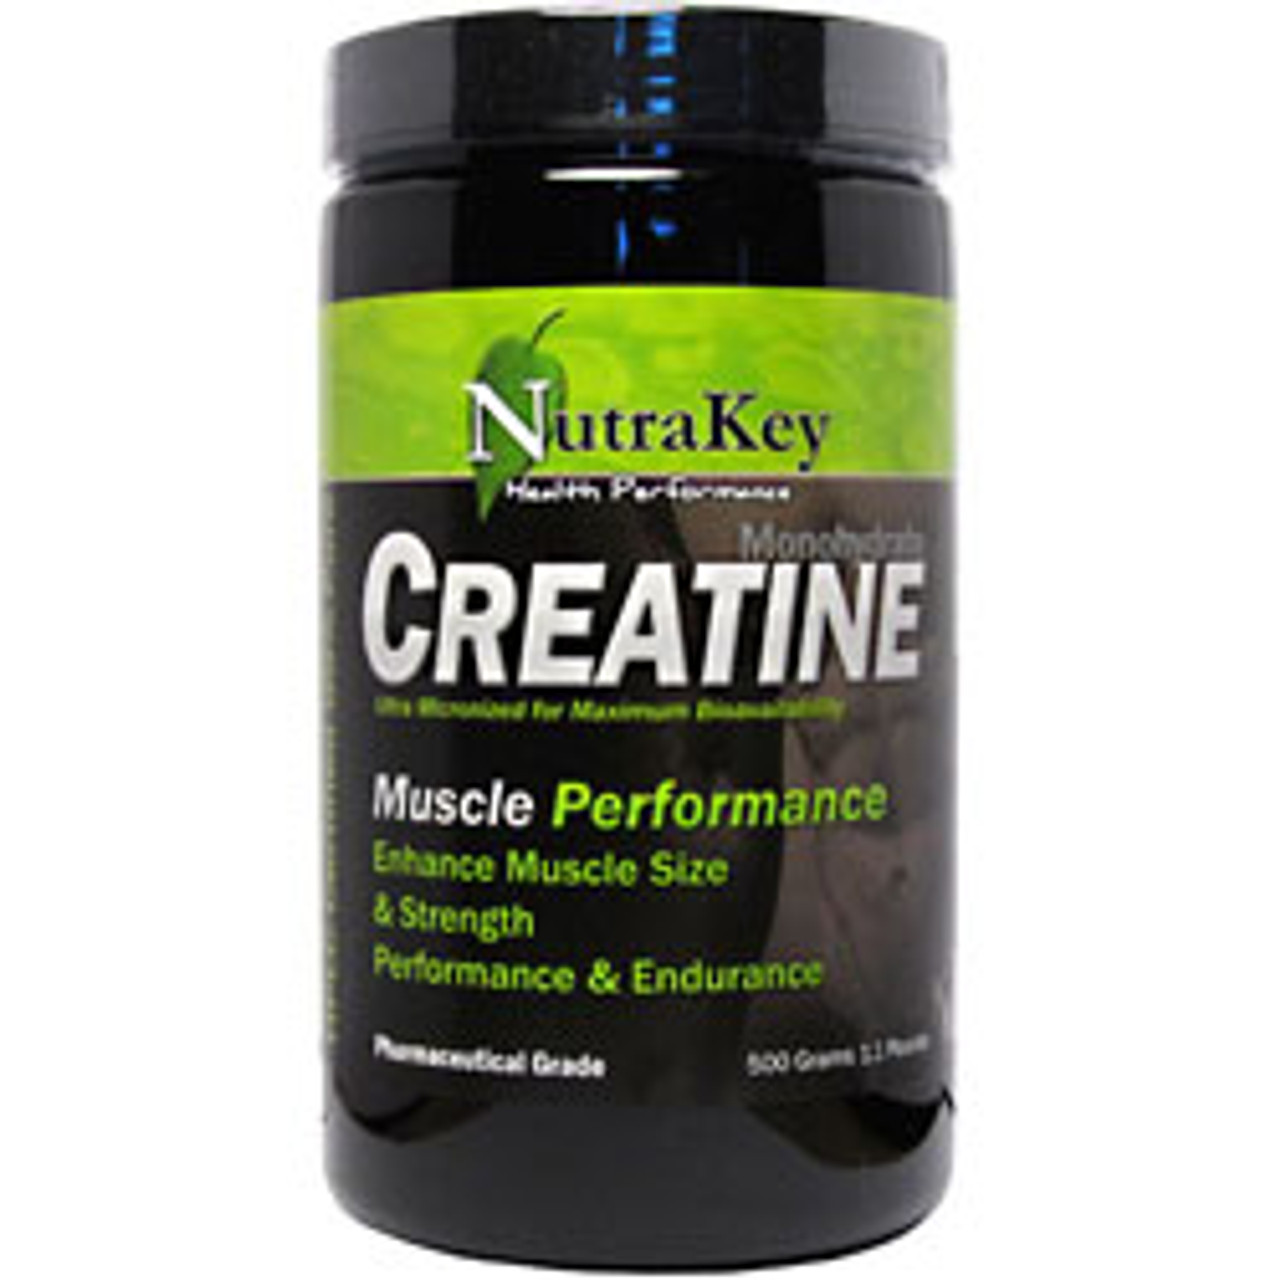 Creatine Monohydrate 500g Nutrakey